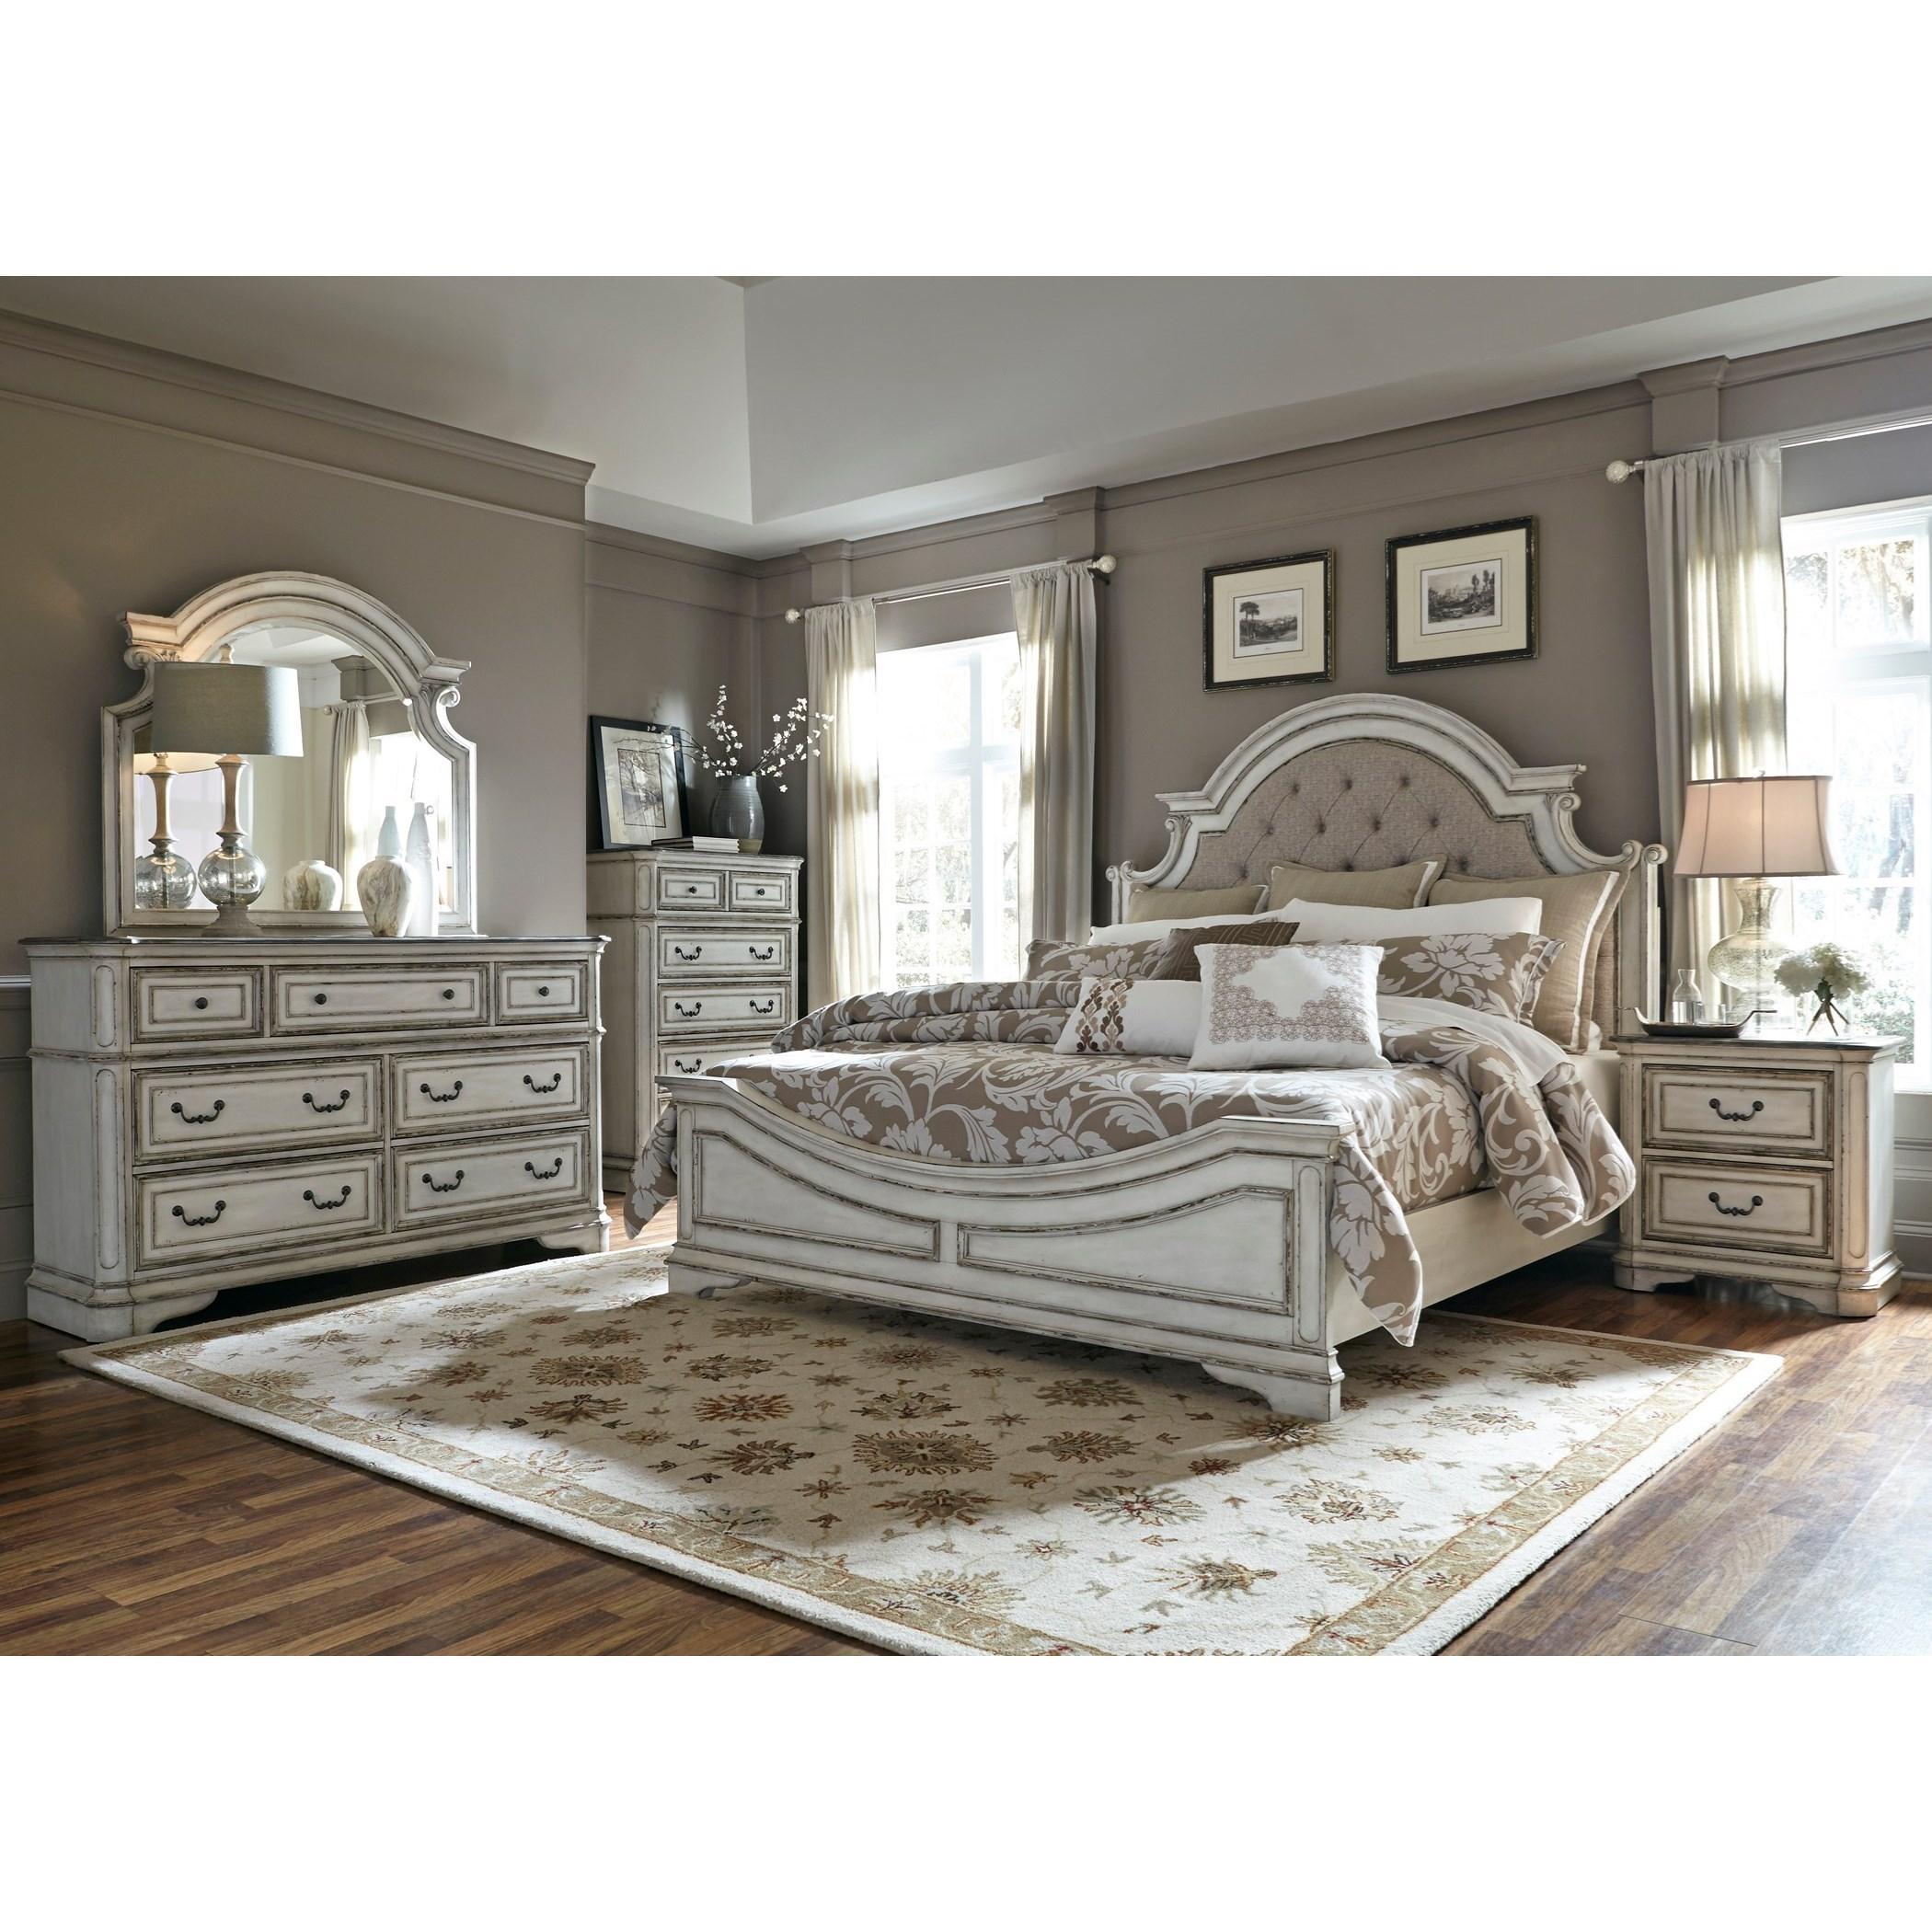 Liberty Furniture Magnolia Manor 244 Br Dm 7 Drawer